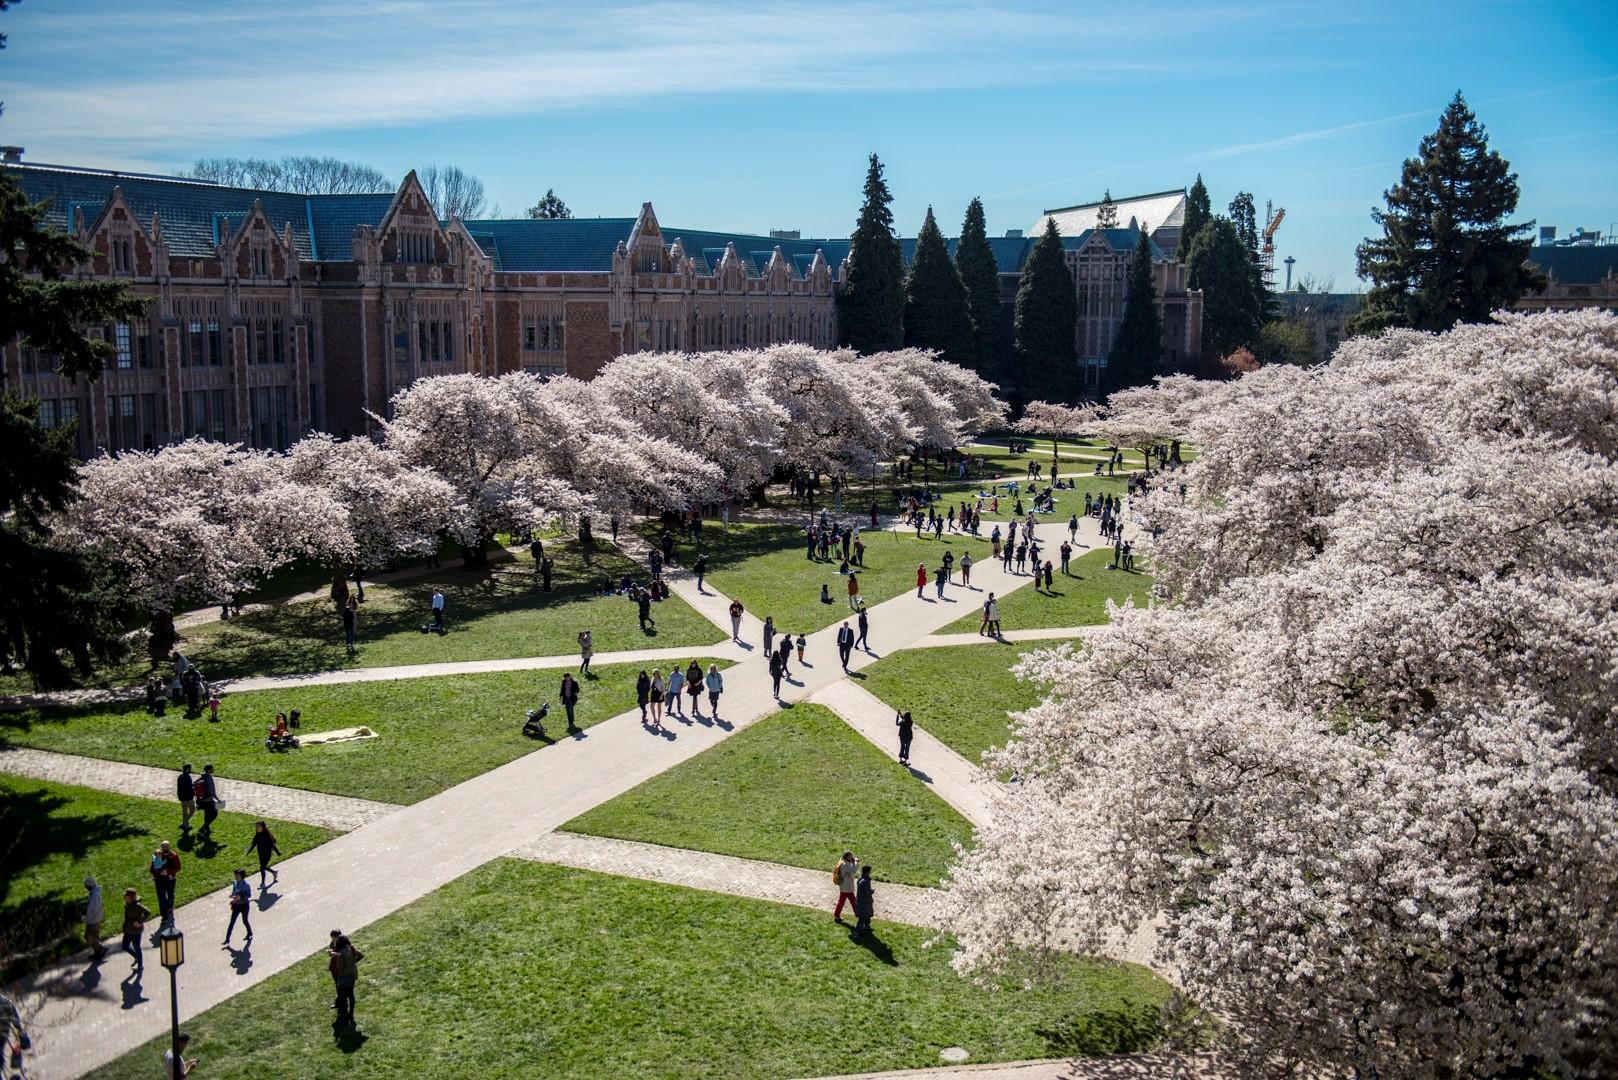 UW Campus IslandWood's partner in the Graduate Program in Environmental Education & Equity